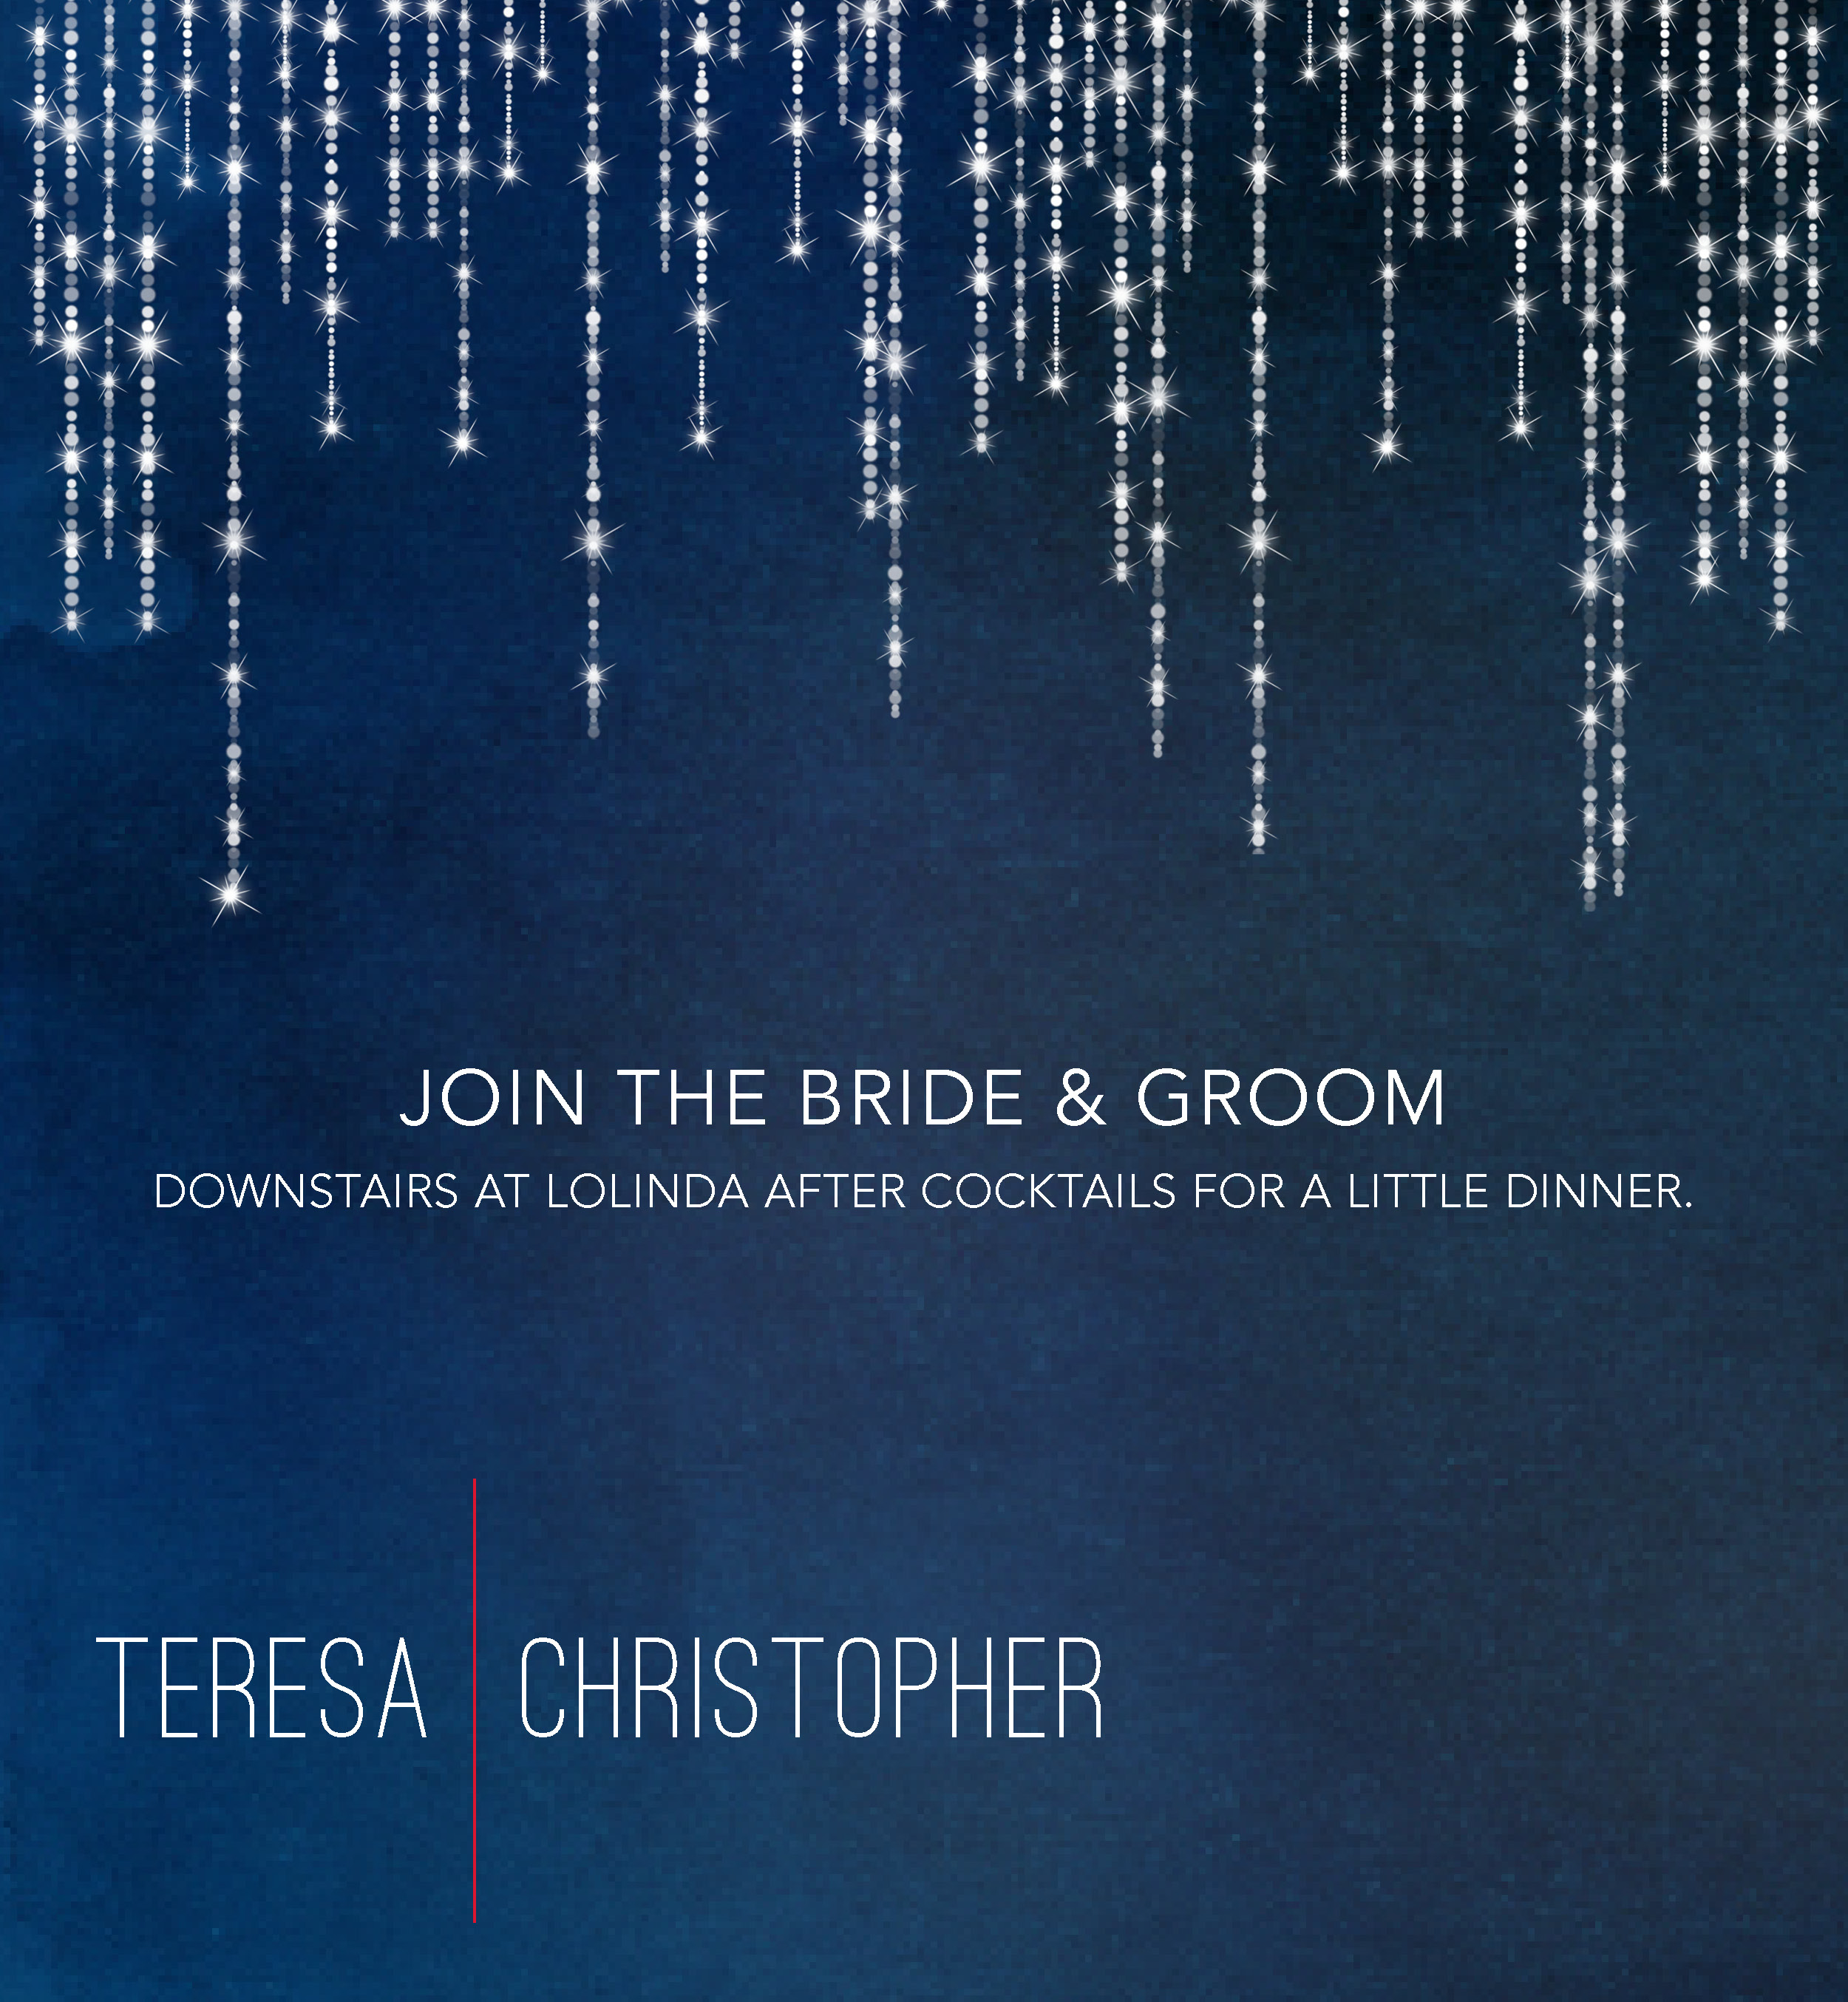 WEDDING  DIGITAL SAVE THE DATE + INVITATIONS + FLORAL DESIGN